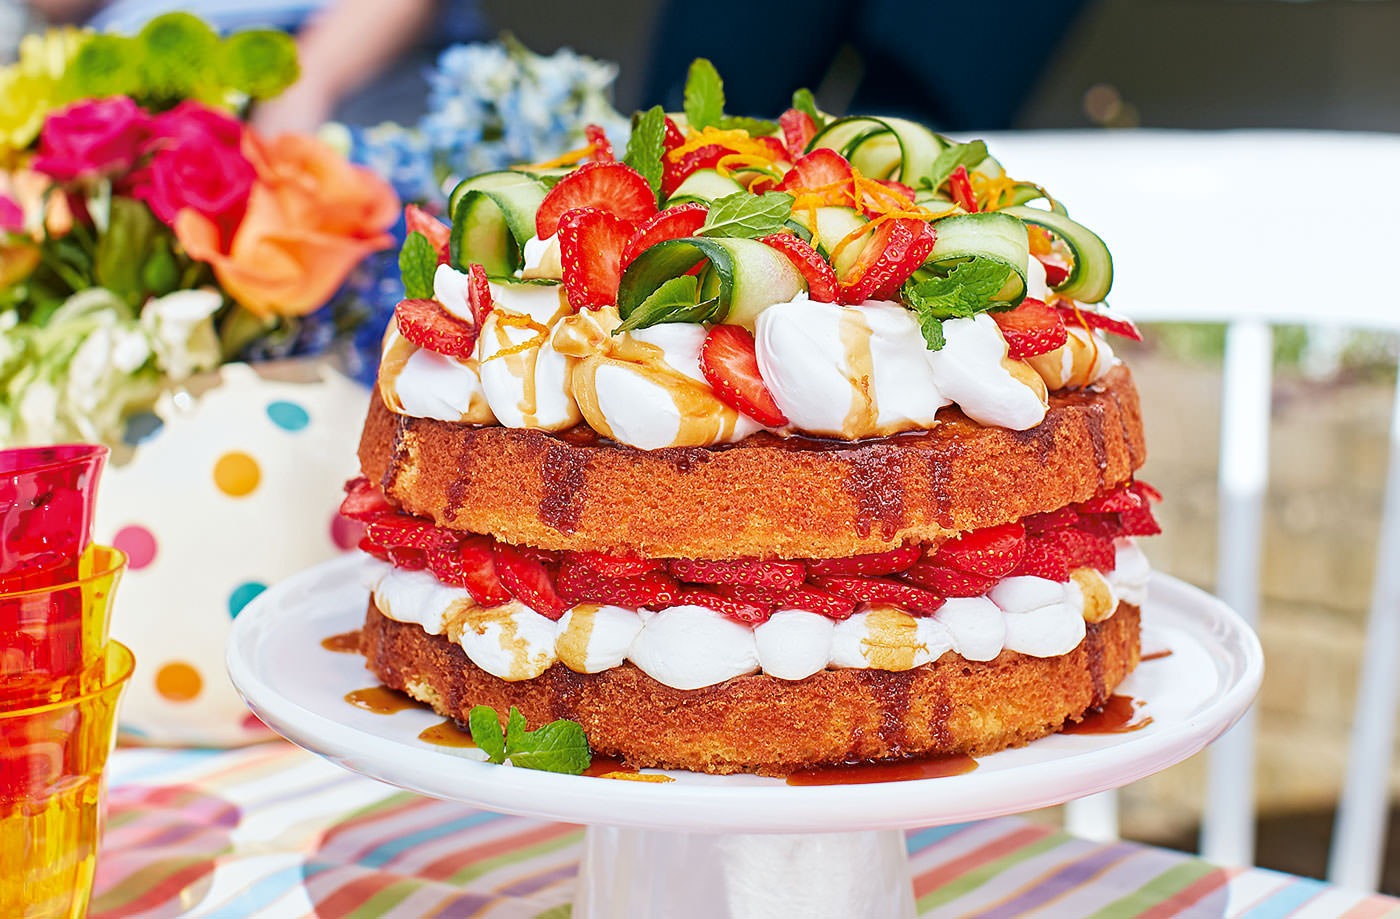 Summer Cake Recipes  Pimms Layer Cake Recipe Summer Cake Recipes